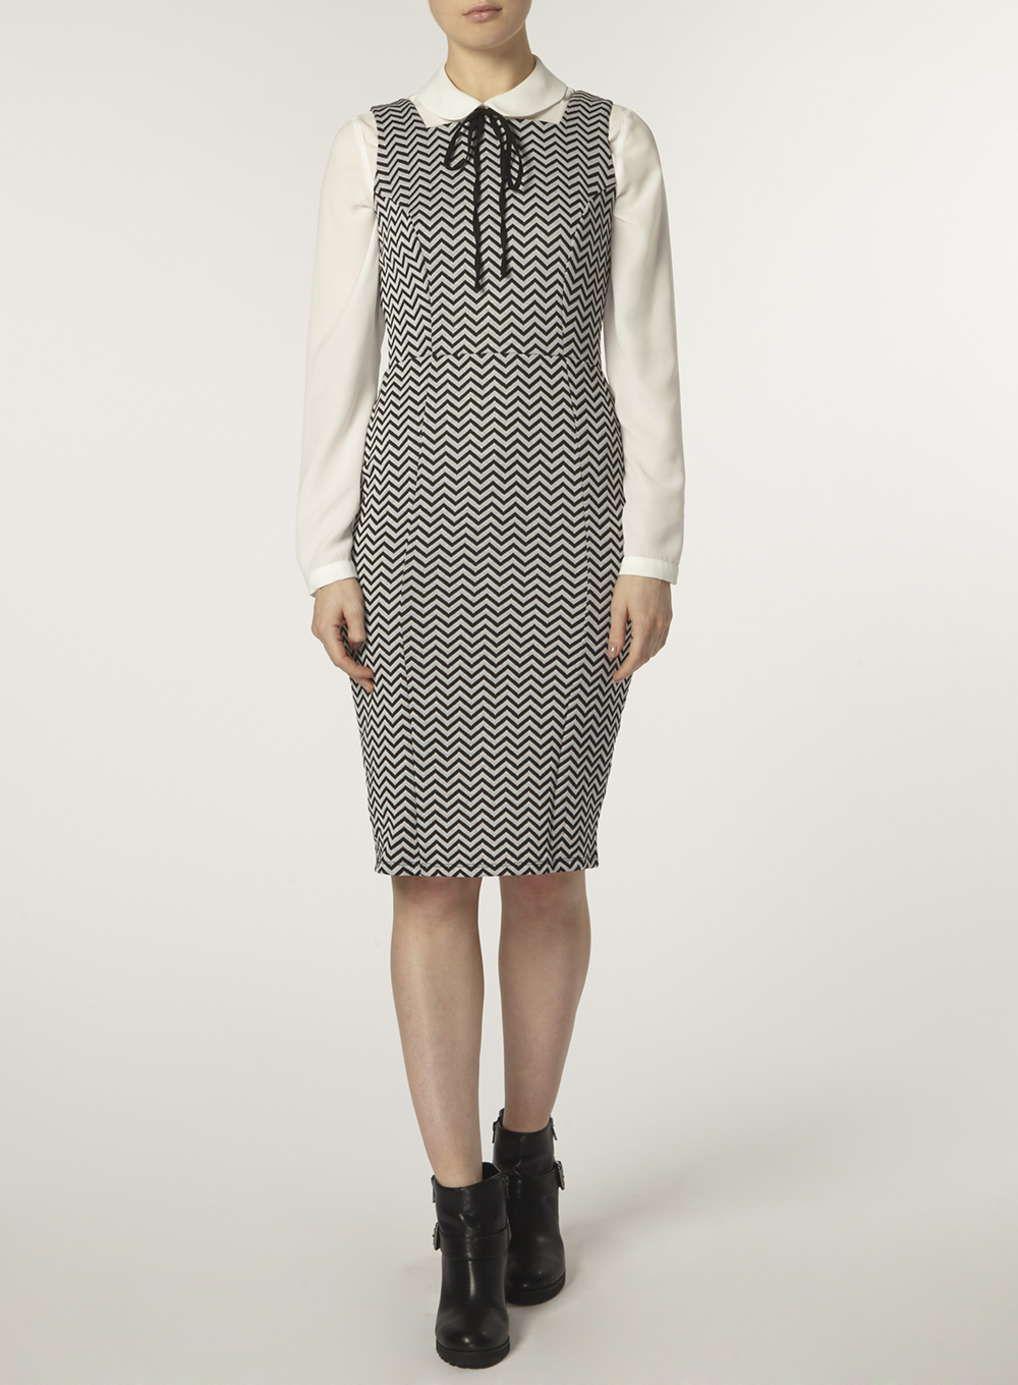 Grey chevron pinny dress - Dorothy Perkins